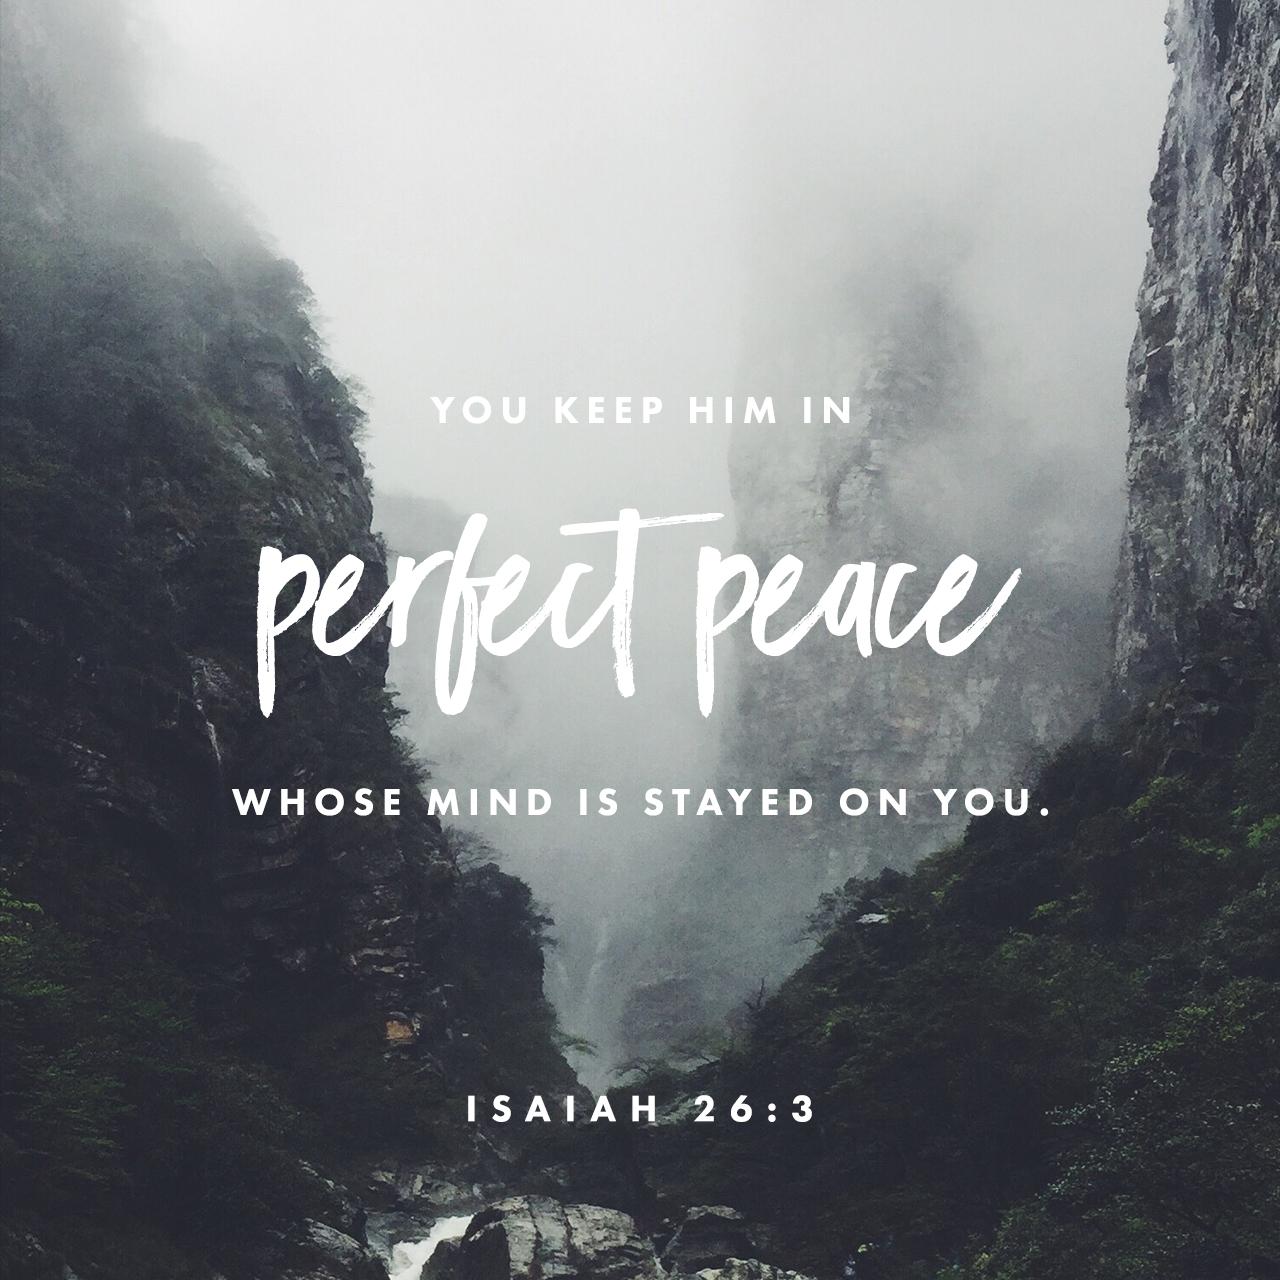 ScriptureArt_0816_-_Isaiah26_3_157x157.jpg